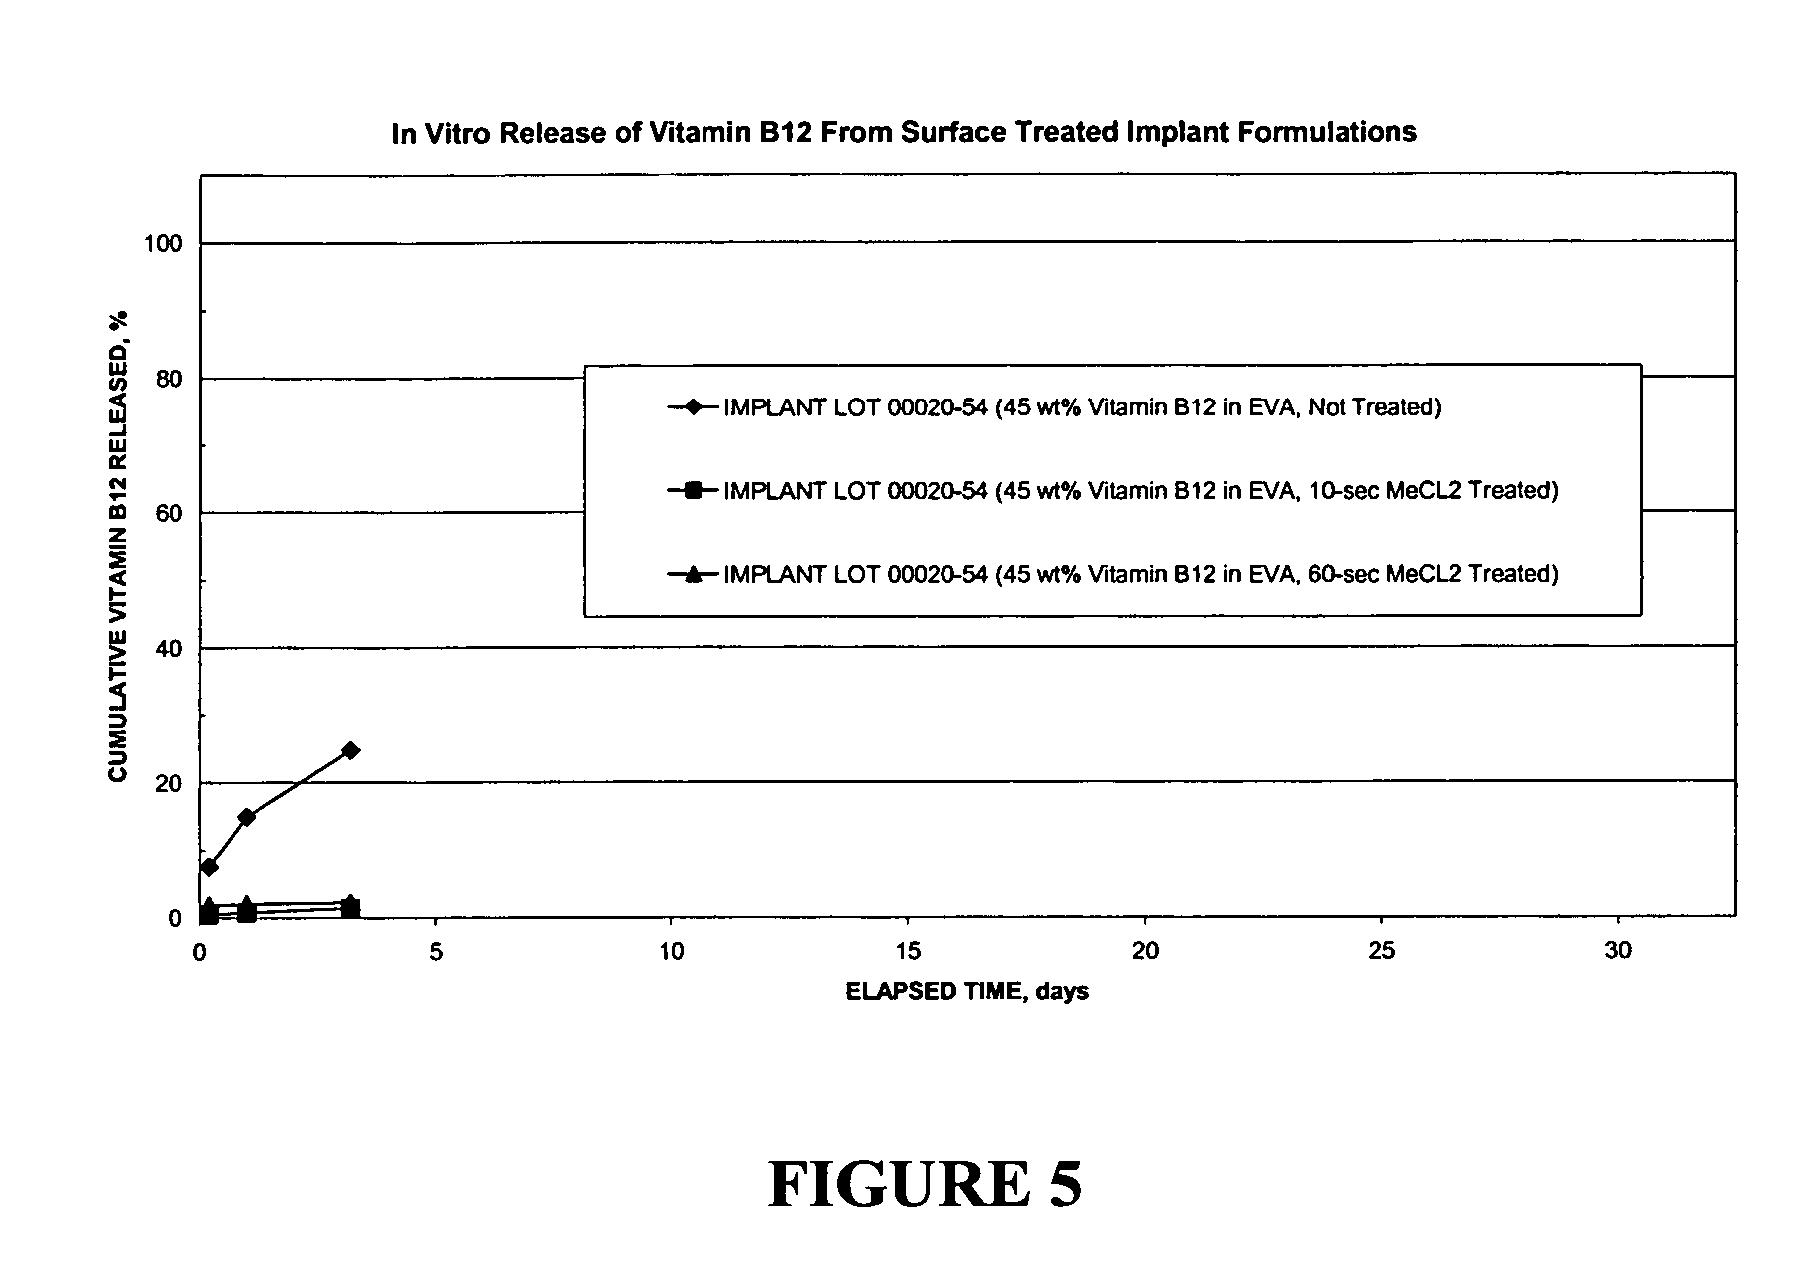 Patent US 8,541,028 B2